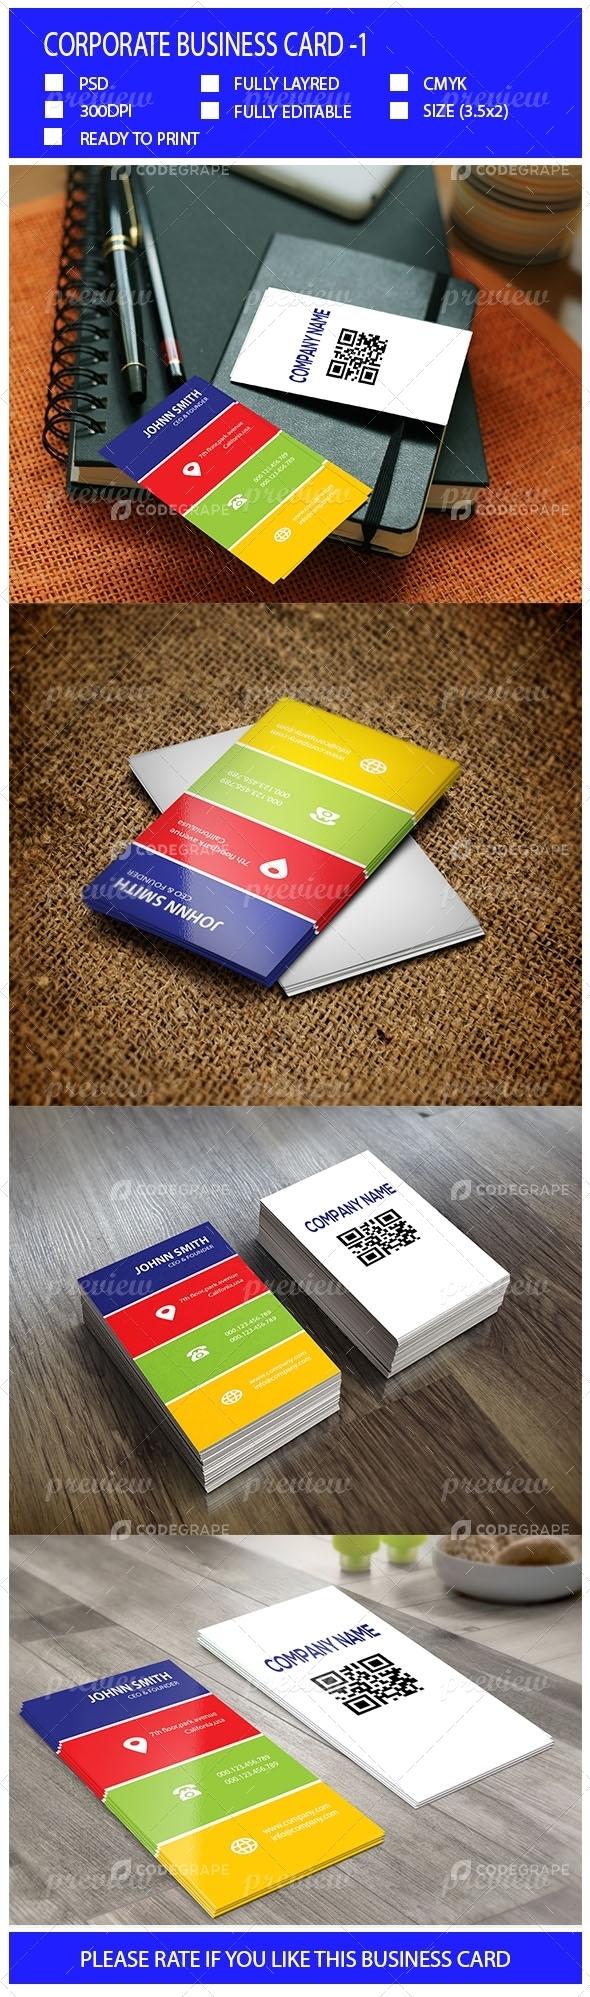 Corporate Business Card-1